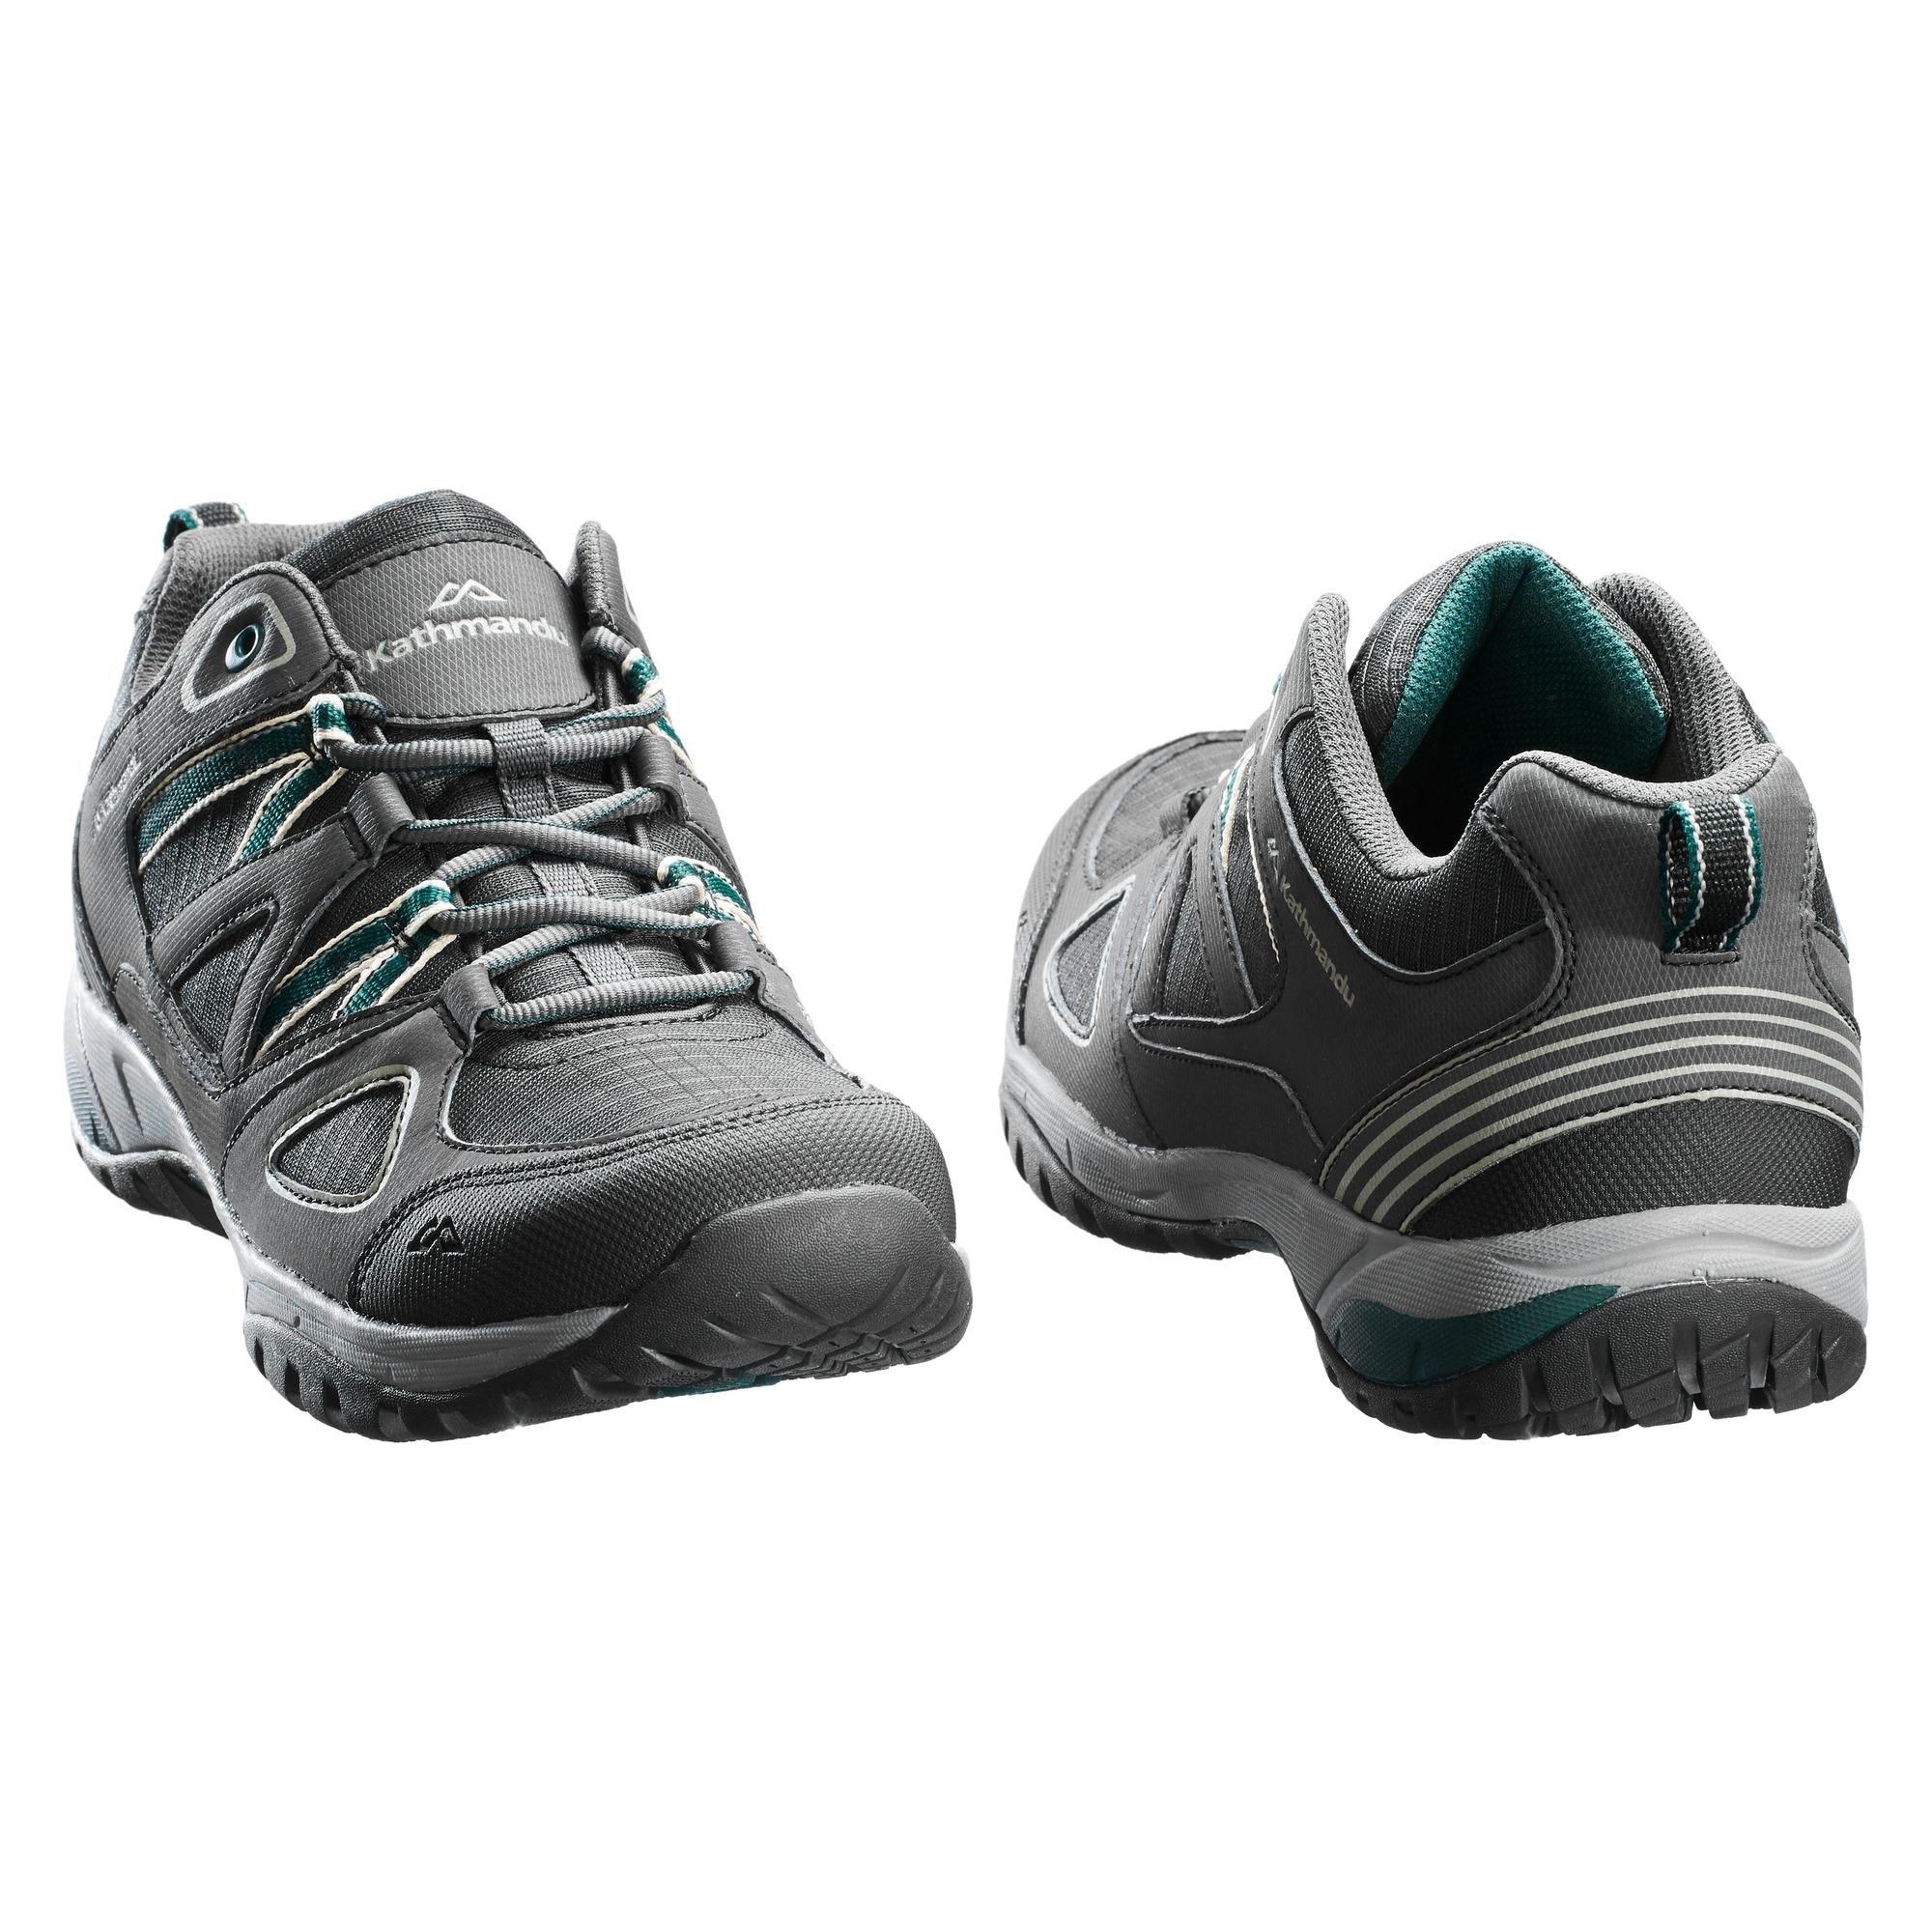 NEW-Kathmandu-Serpentine-II-Men-039-s-Lighweight-Durable-Hiking-Walking-Shoes thumbnail 7